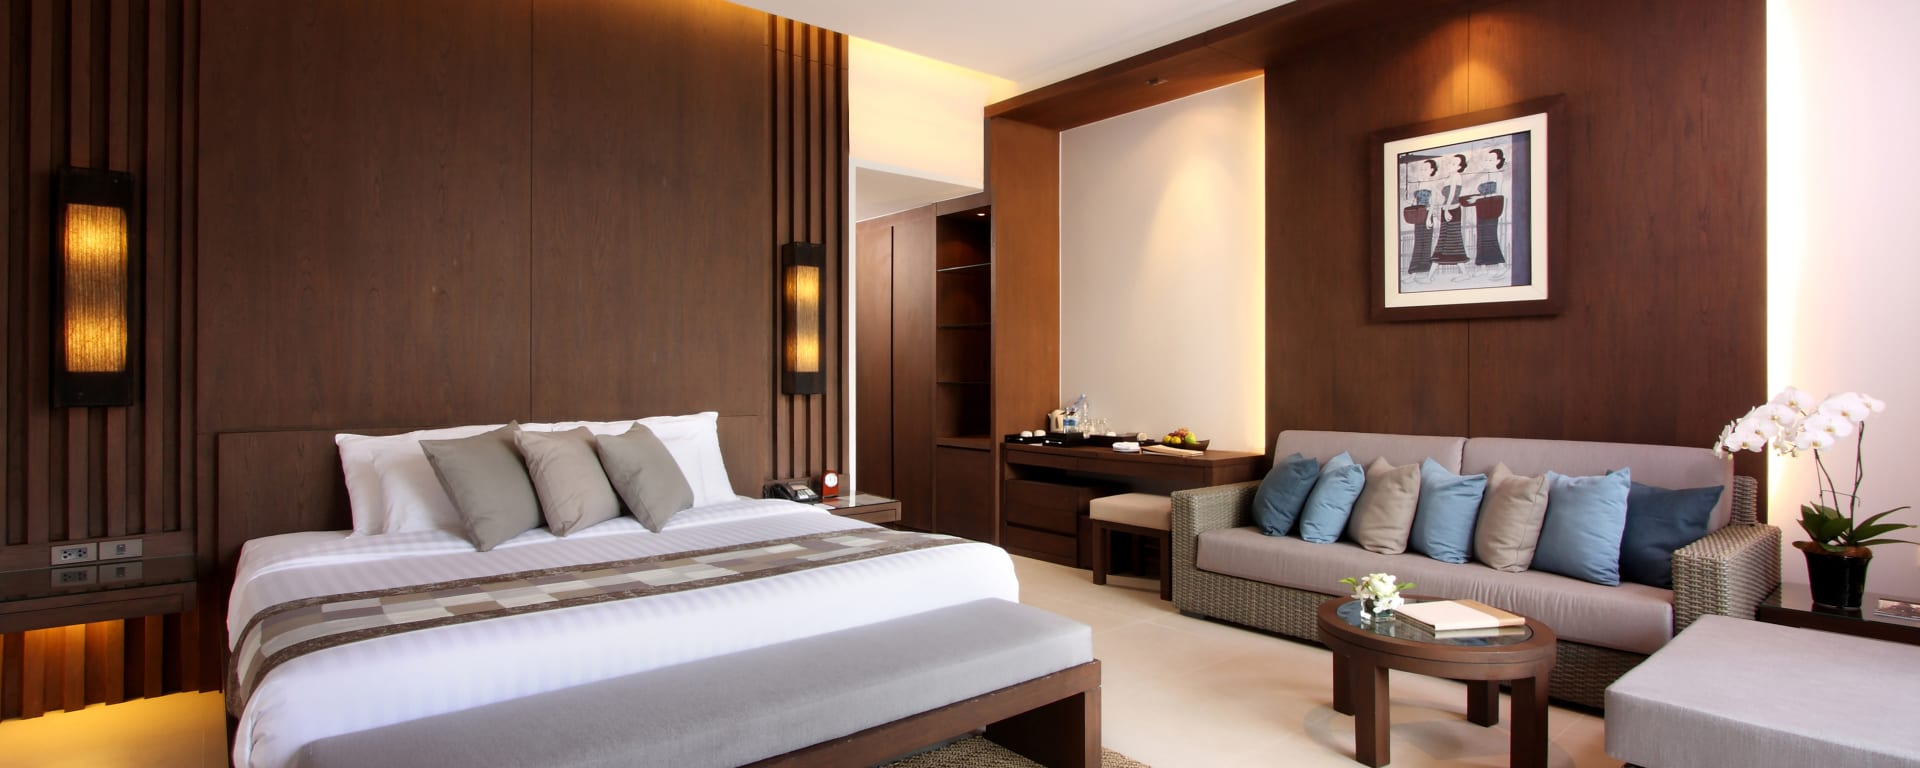 Cape Panwa Hotel in Phuket: Phuket Cape Panwa Hotel Junior Suite